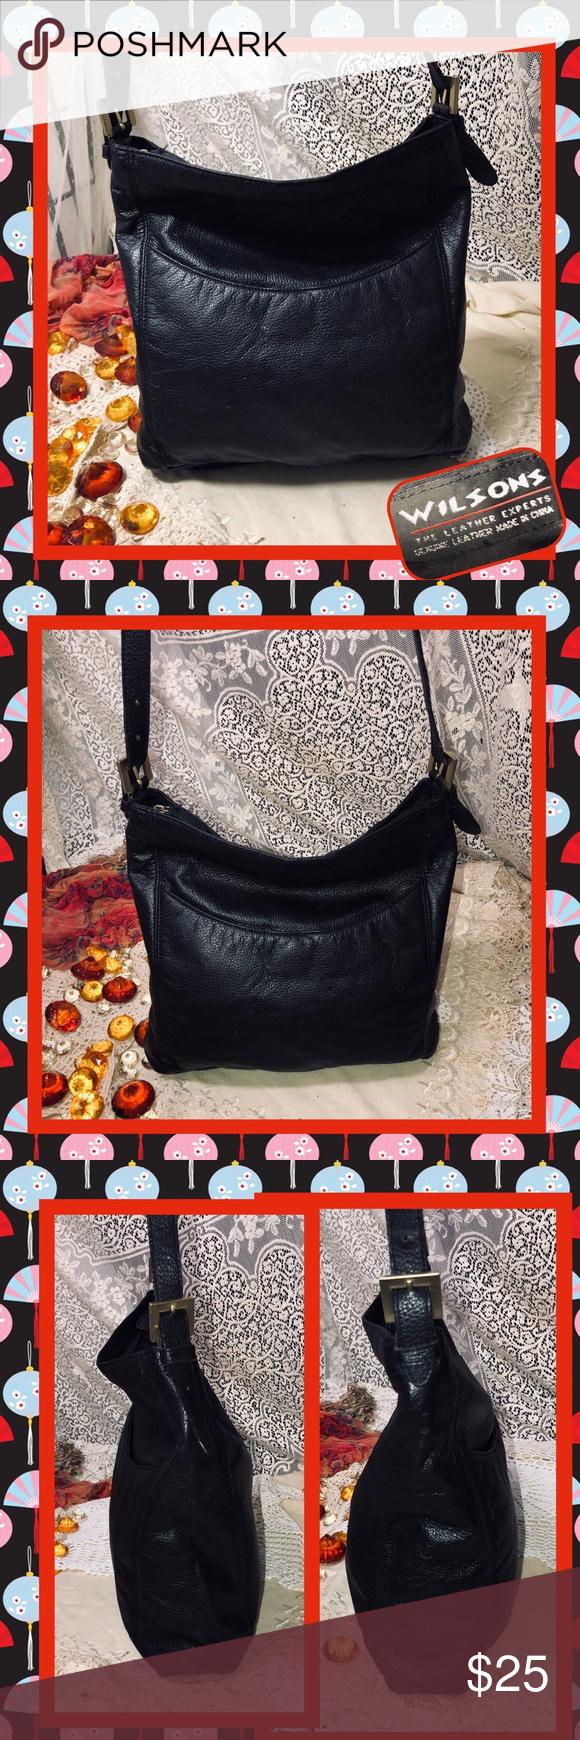 Wilsons Leather Black Shoulder Bag USED Very nice soft